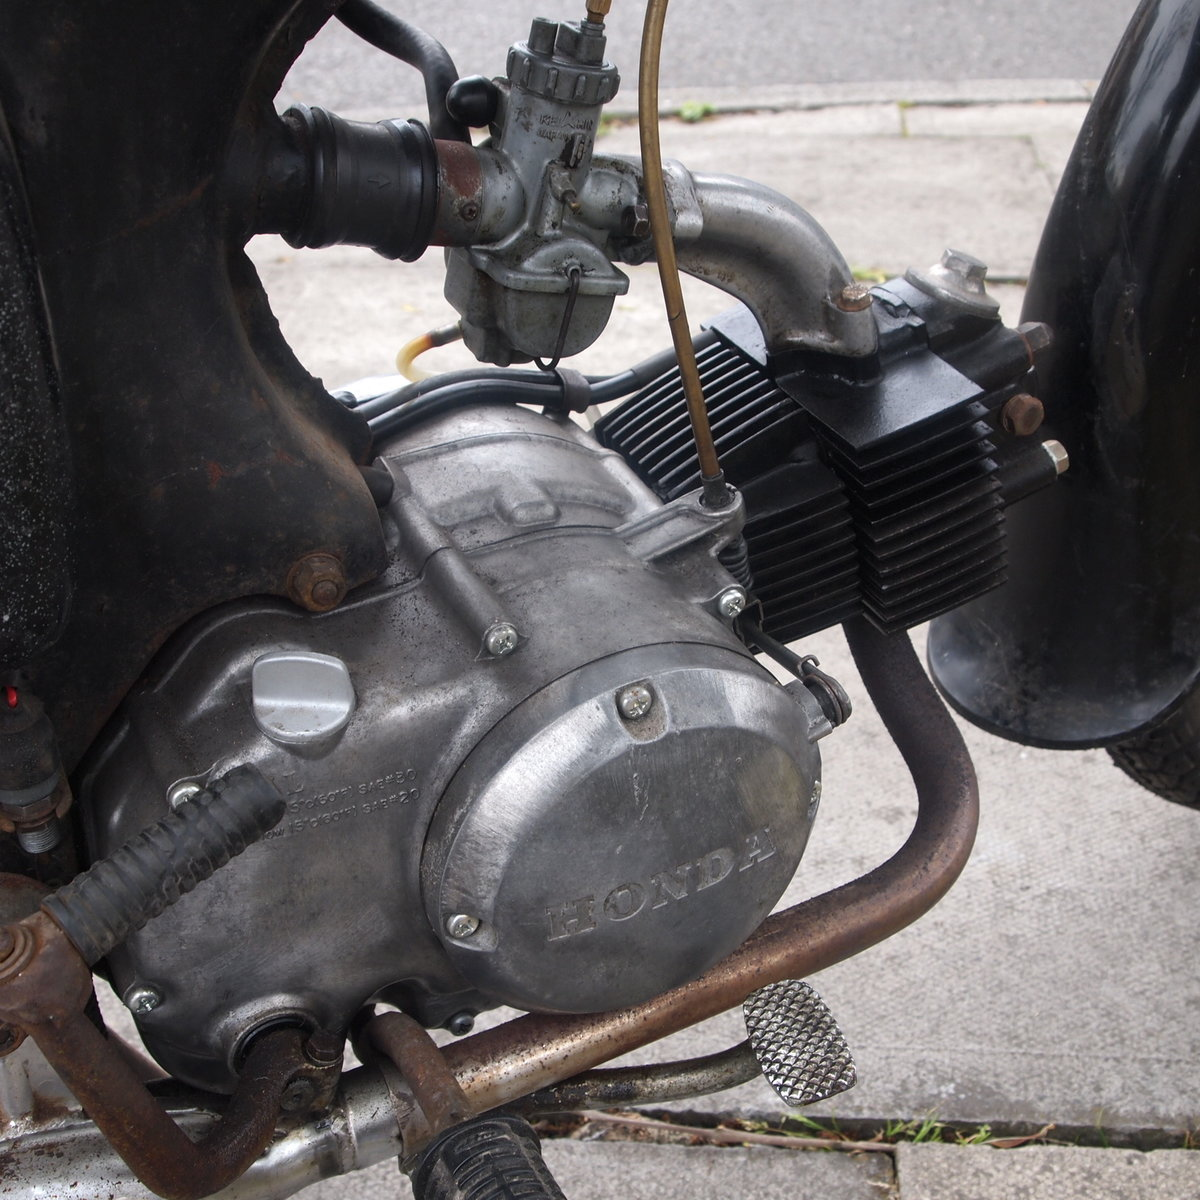 1967 Honda C200 Original Running UK Bike, RESERVED FOR ALAN. SOLD (picture 4 of 6)